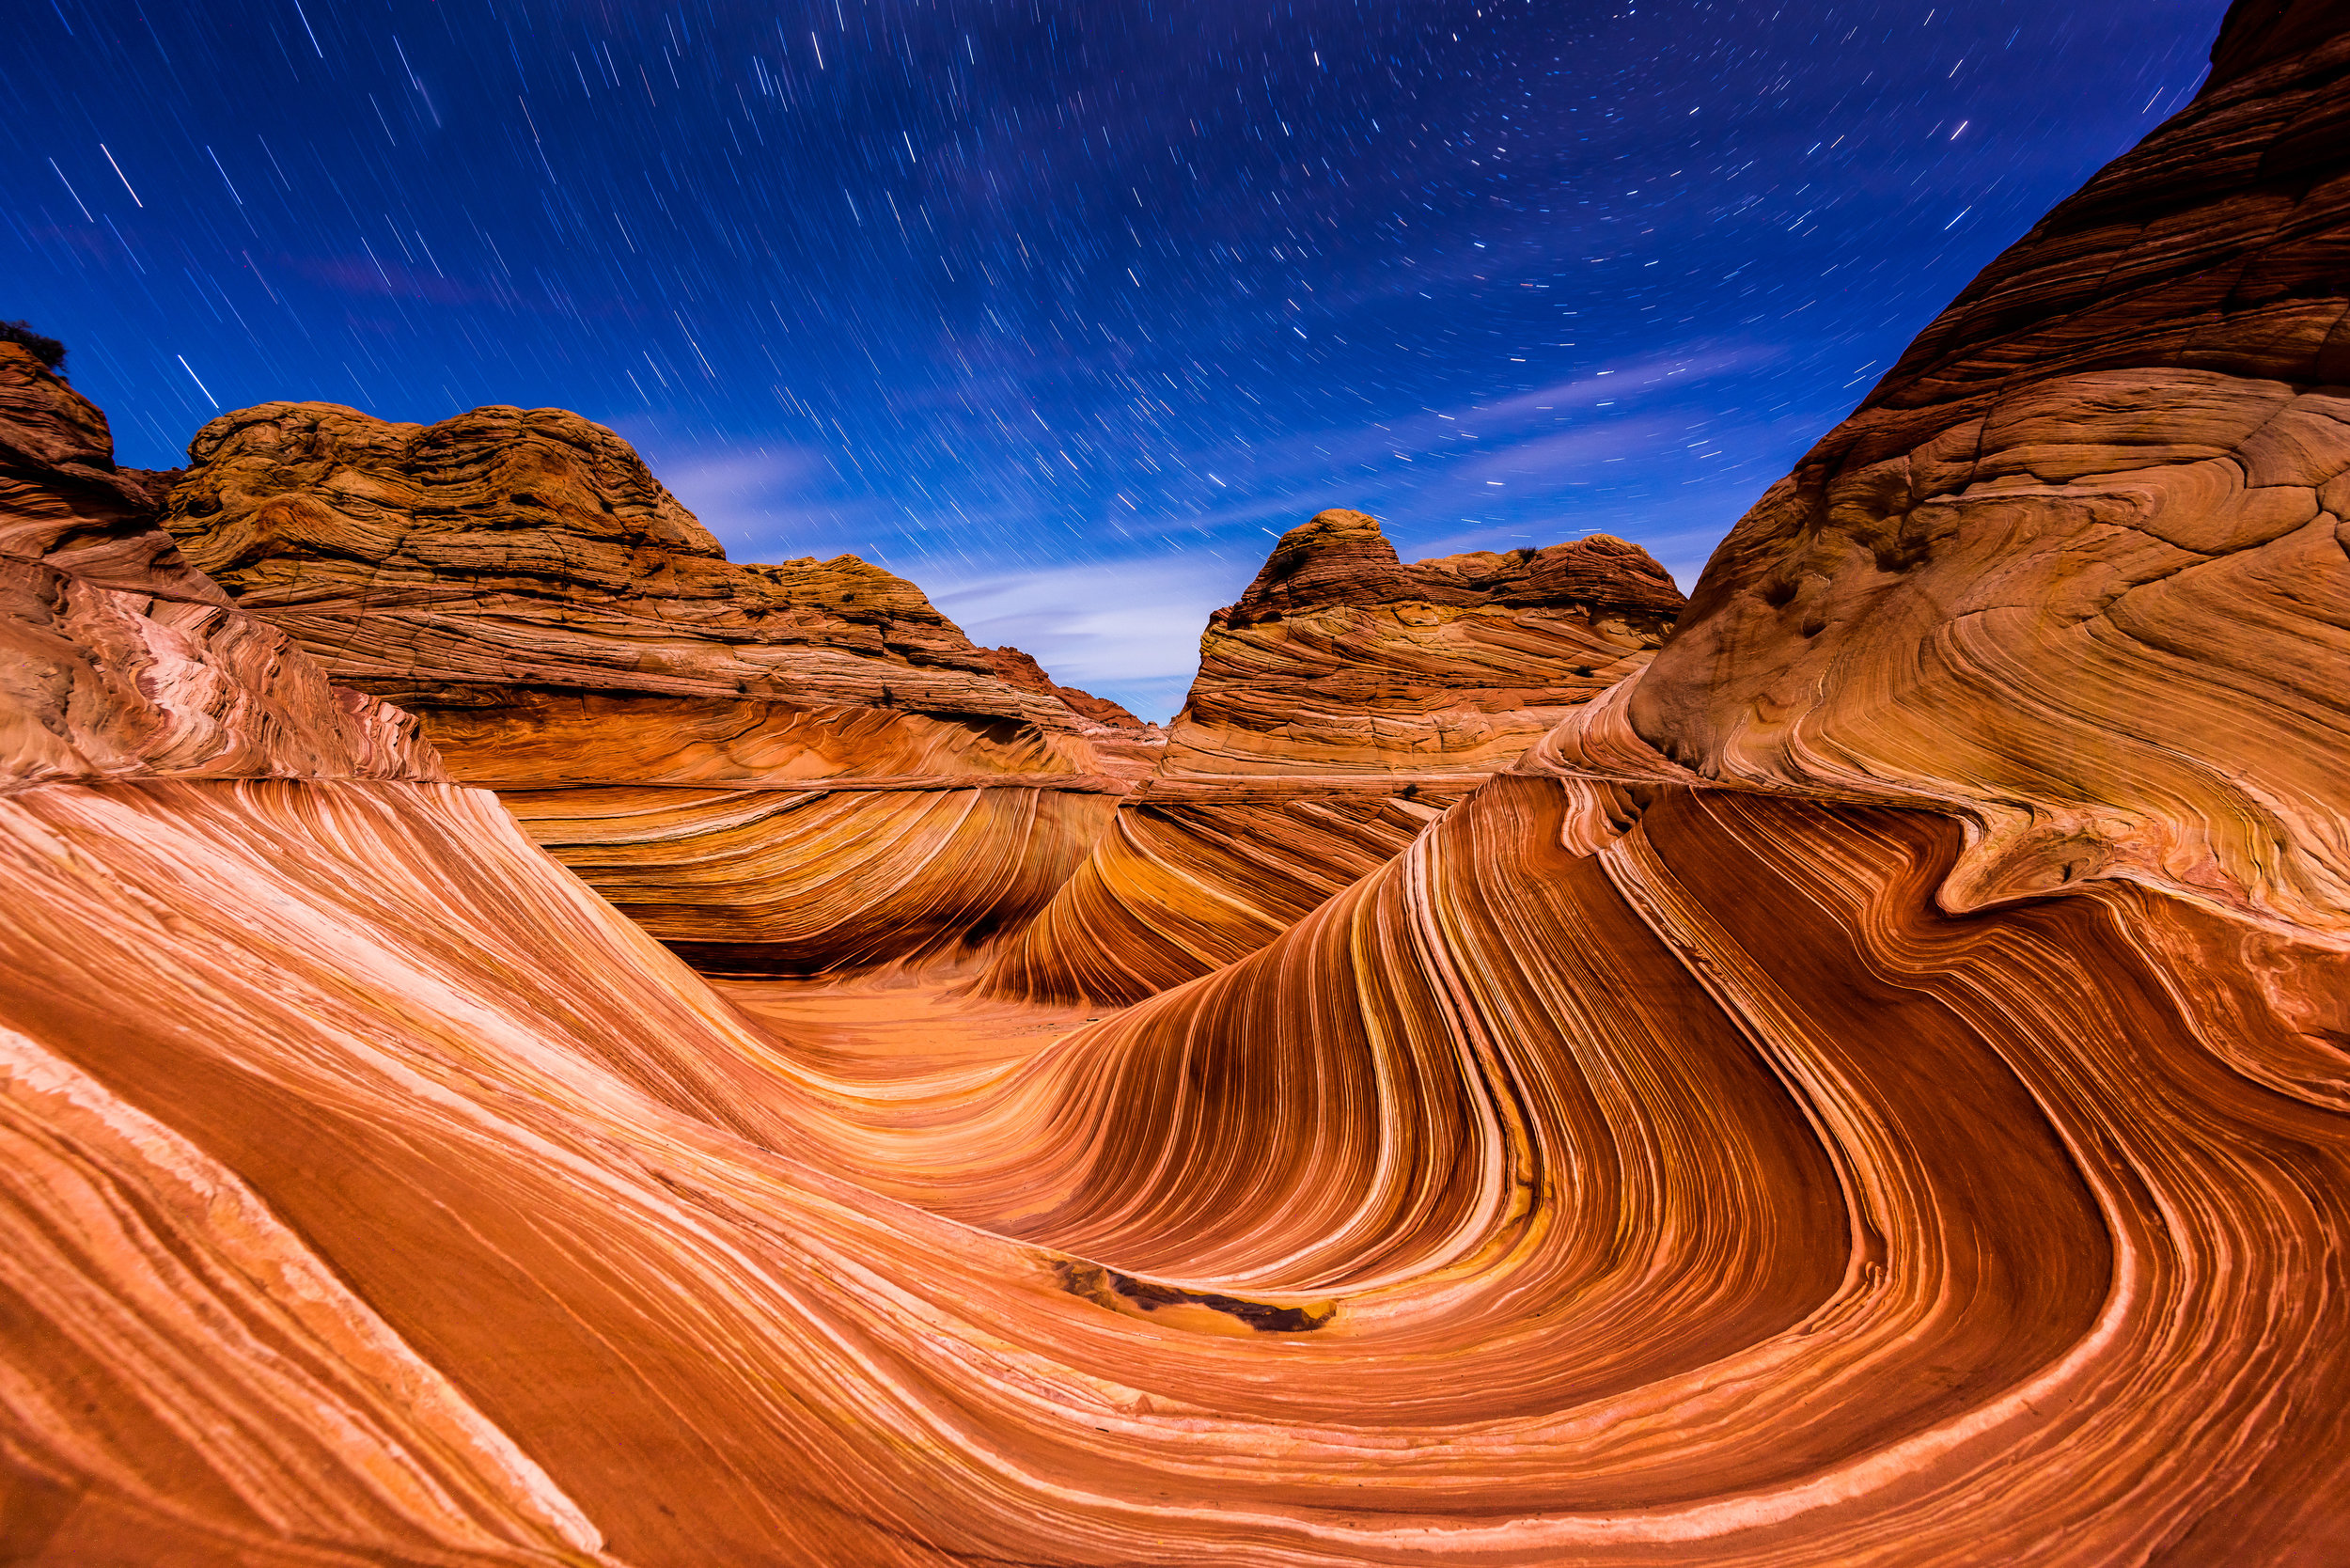 ....  Canyons, Felsen und Vulkane  ..  Canyons, rocks, volcanons  ....